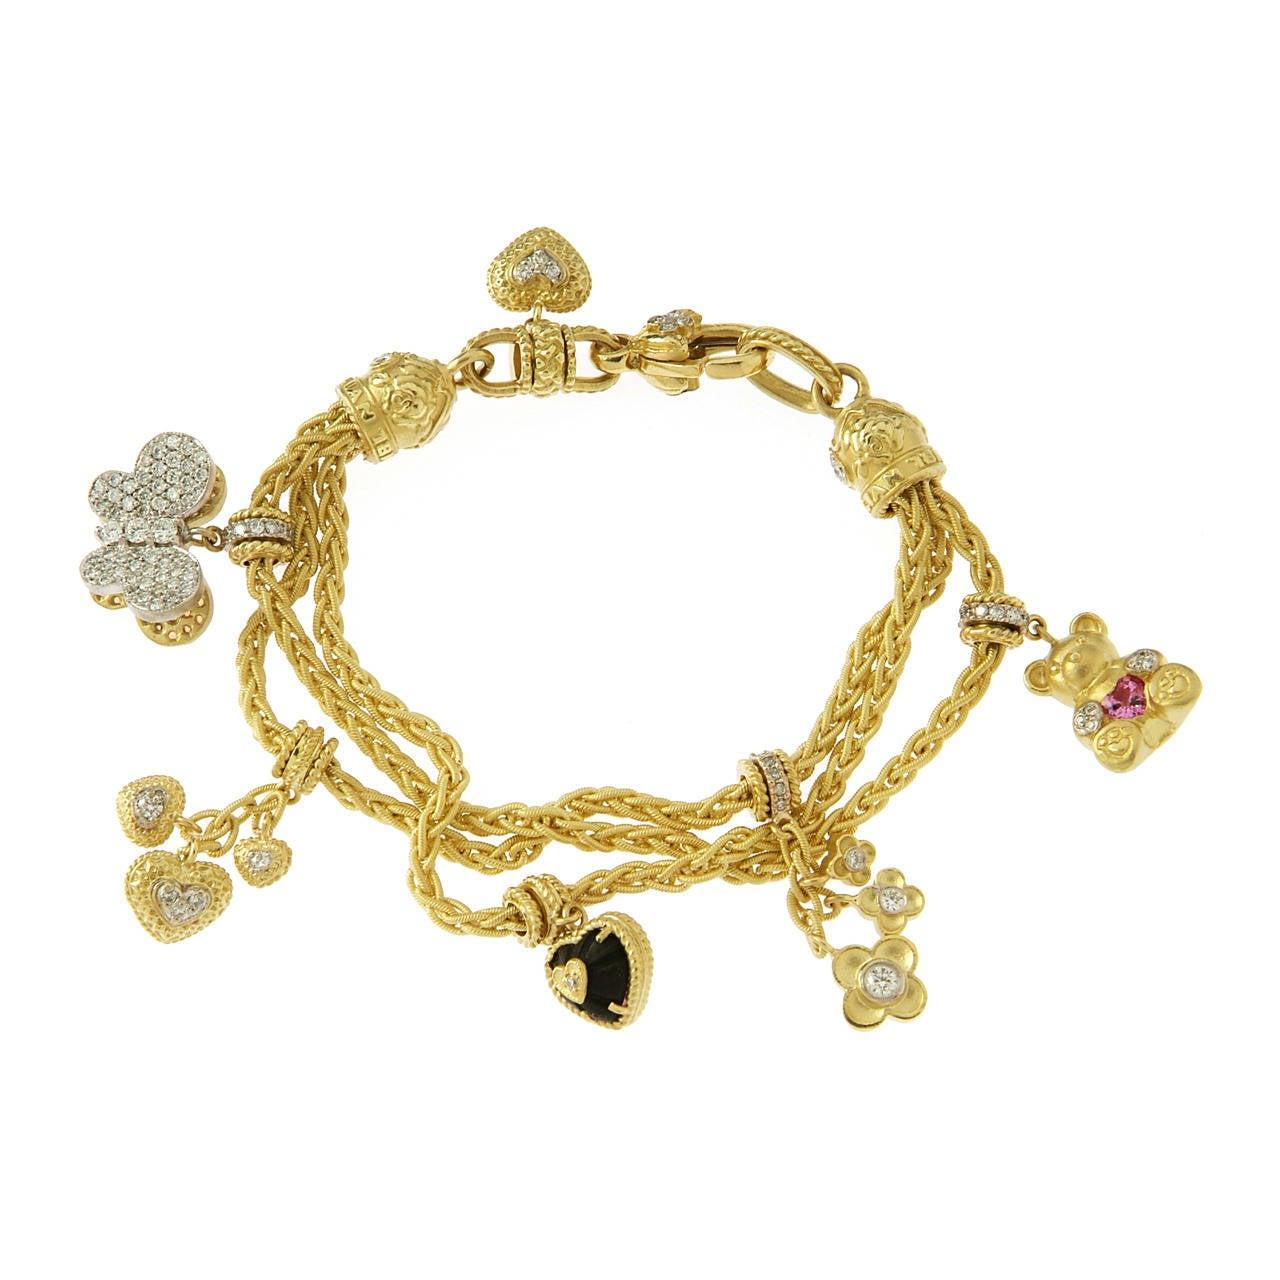 diamond gold charm bracelet at 1stdibs